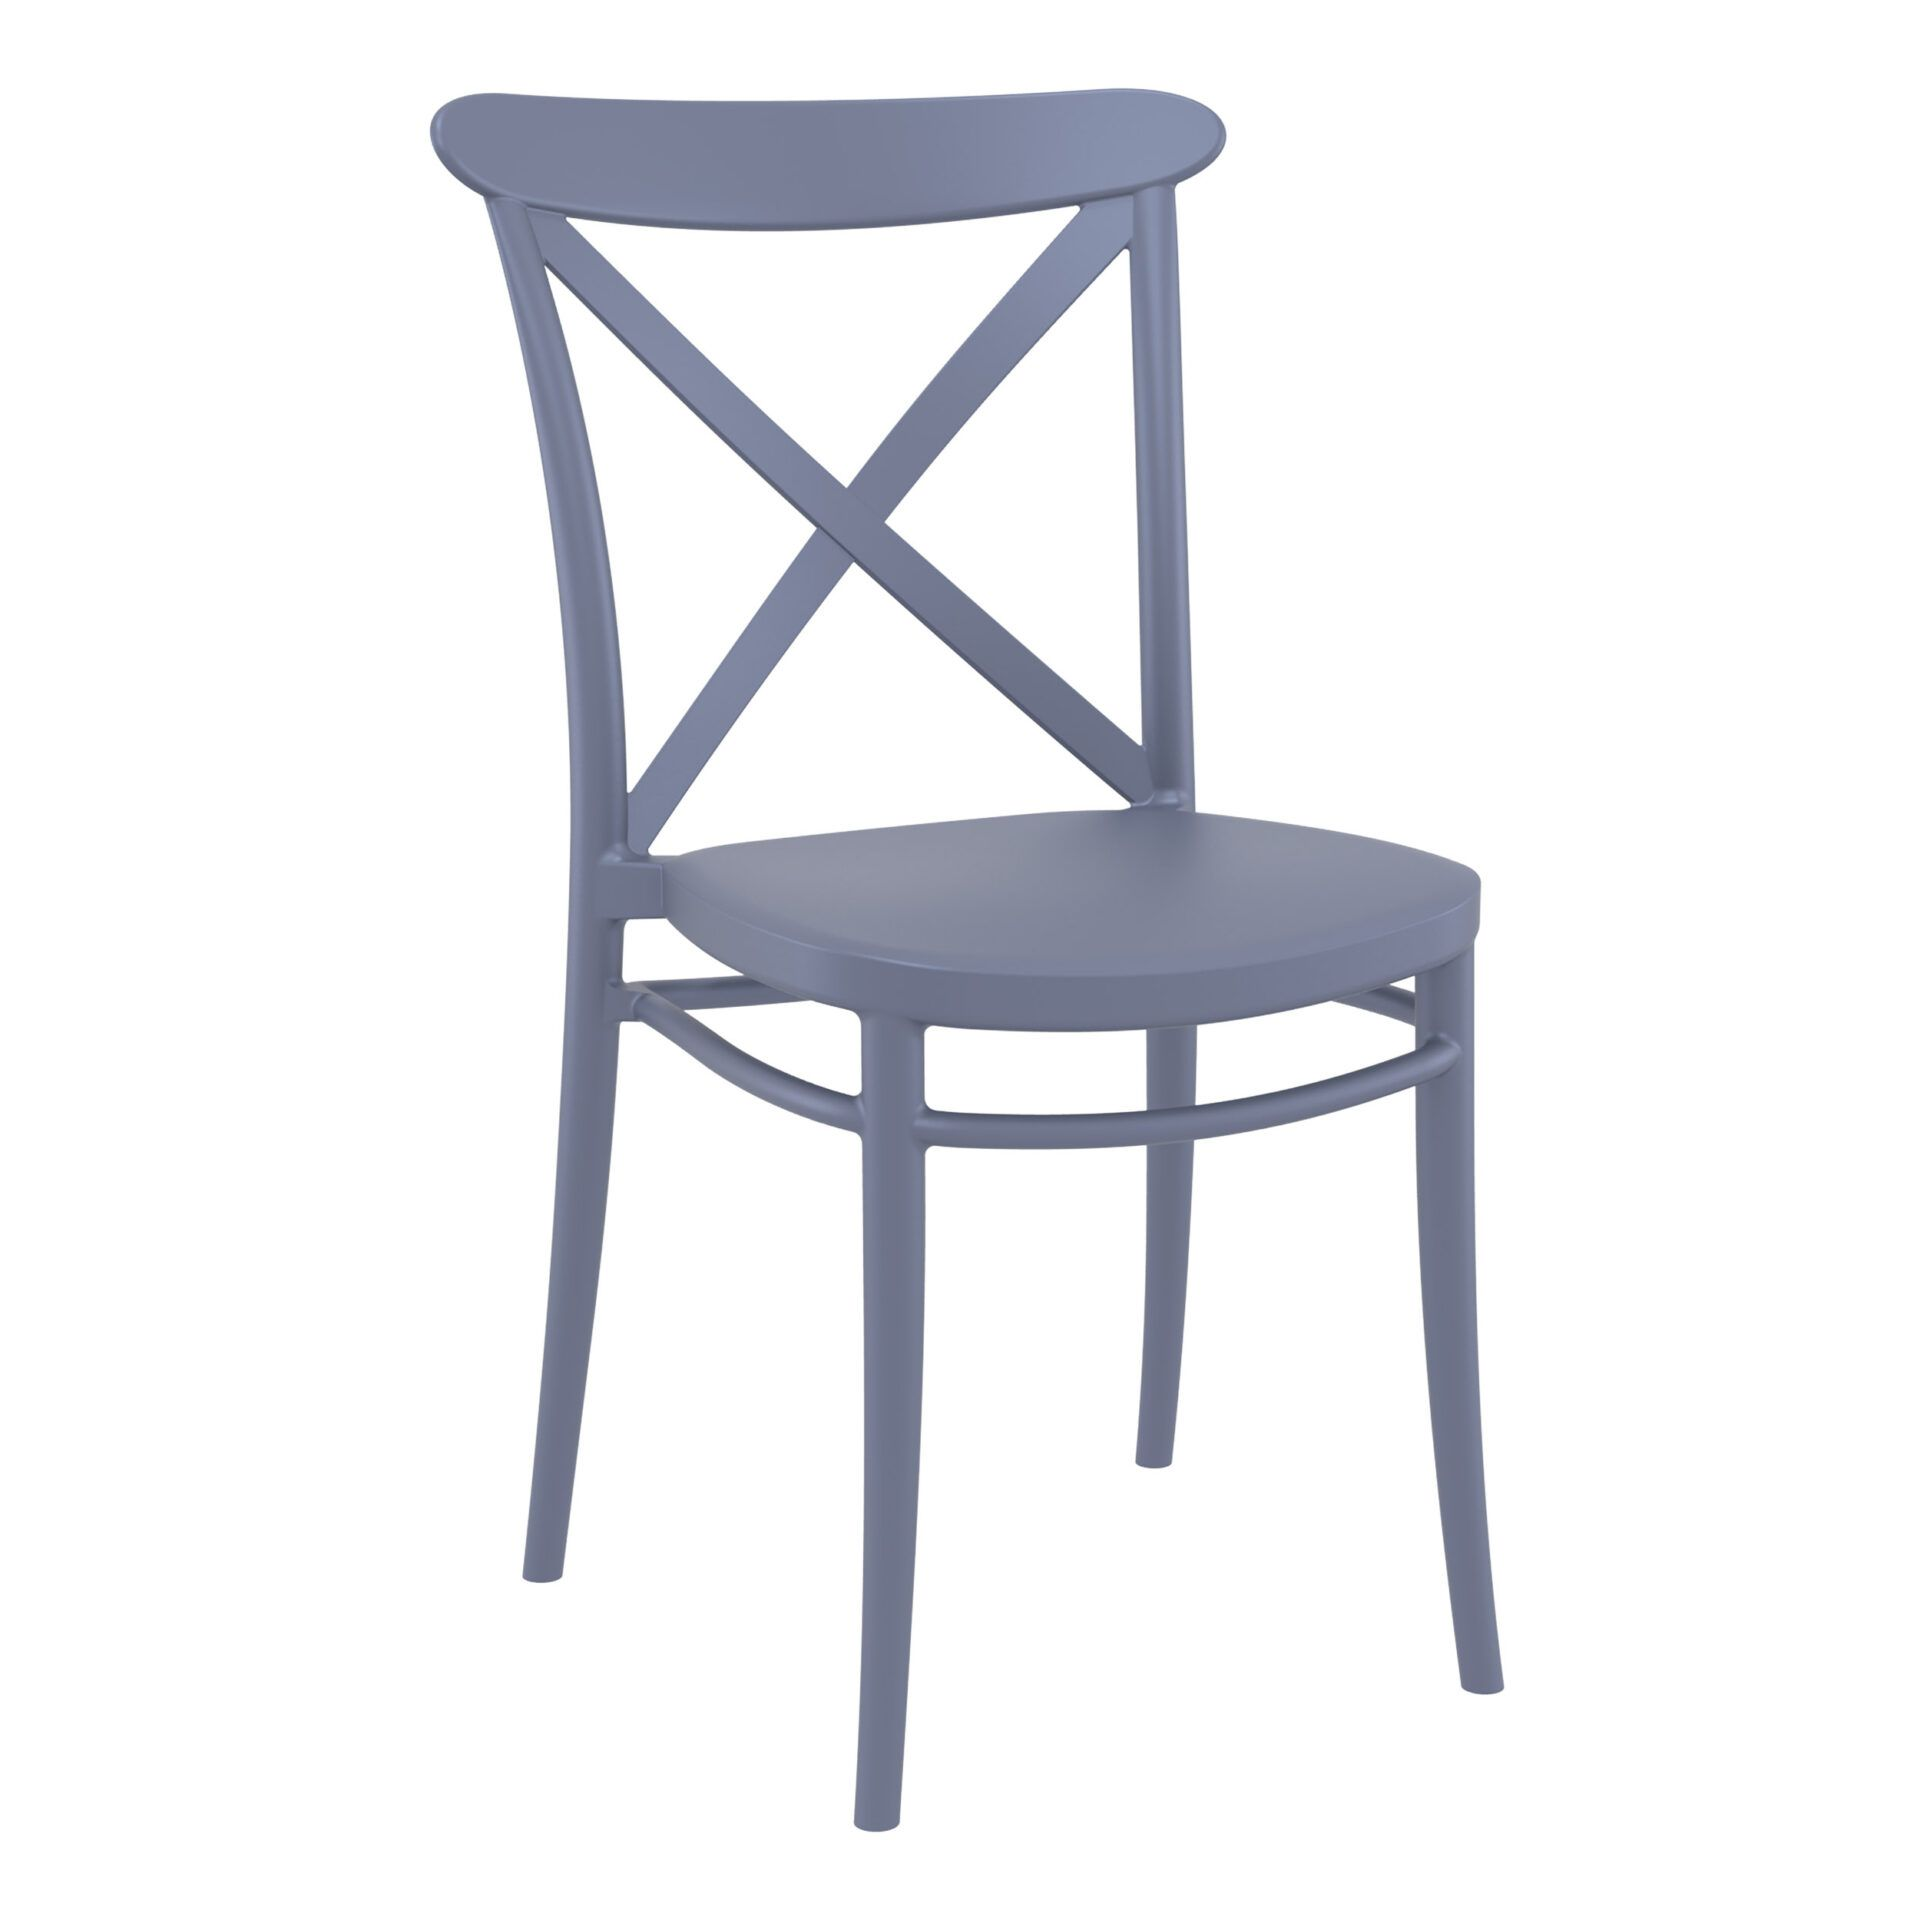 cafe polypropylene cross chair darkgrey front side